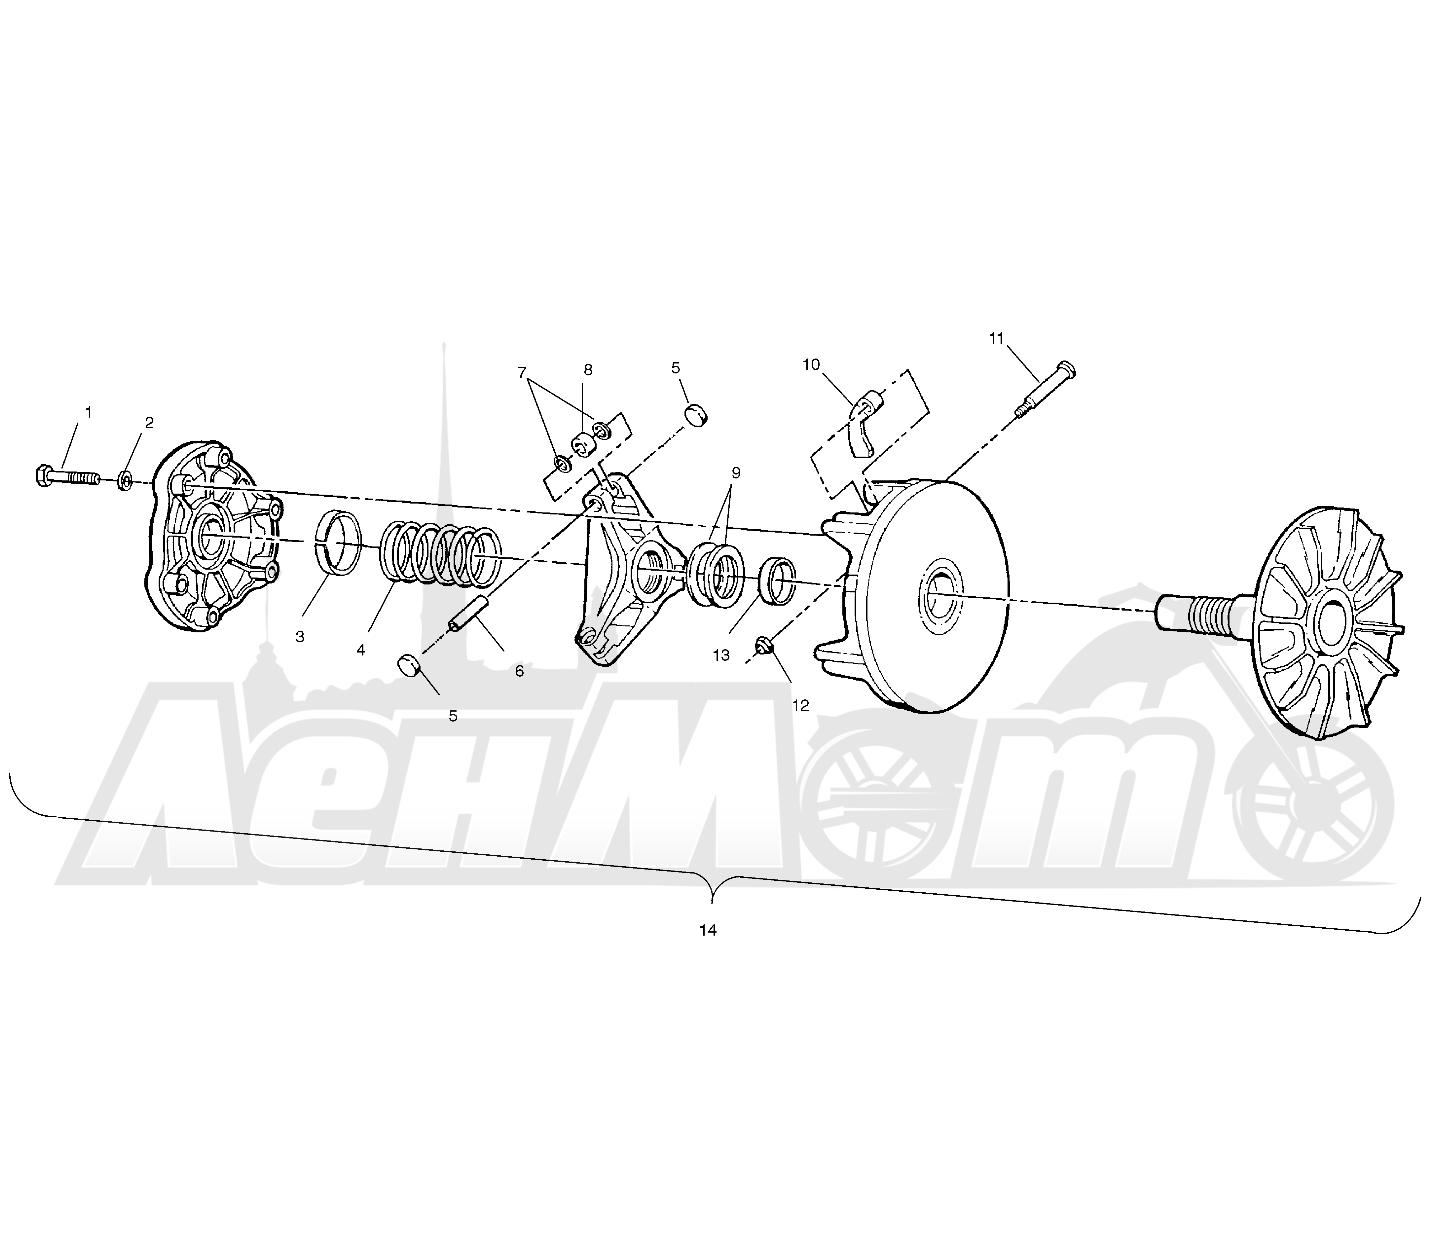 Запчасти для Квадроцикла Polaris 1997 SWEDISH SPORTSMAN 50 - S97CH50E Раздел: DRIVE CLUTCH - W97CH50A | ведущий вариатор W97CH50A